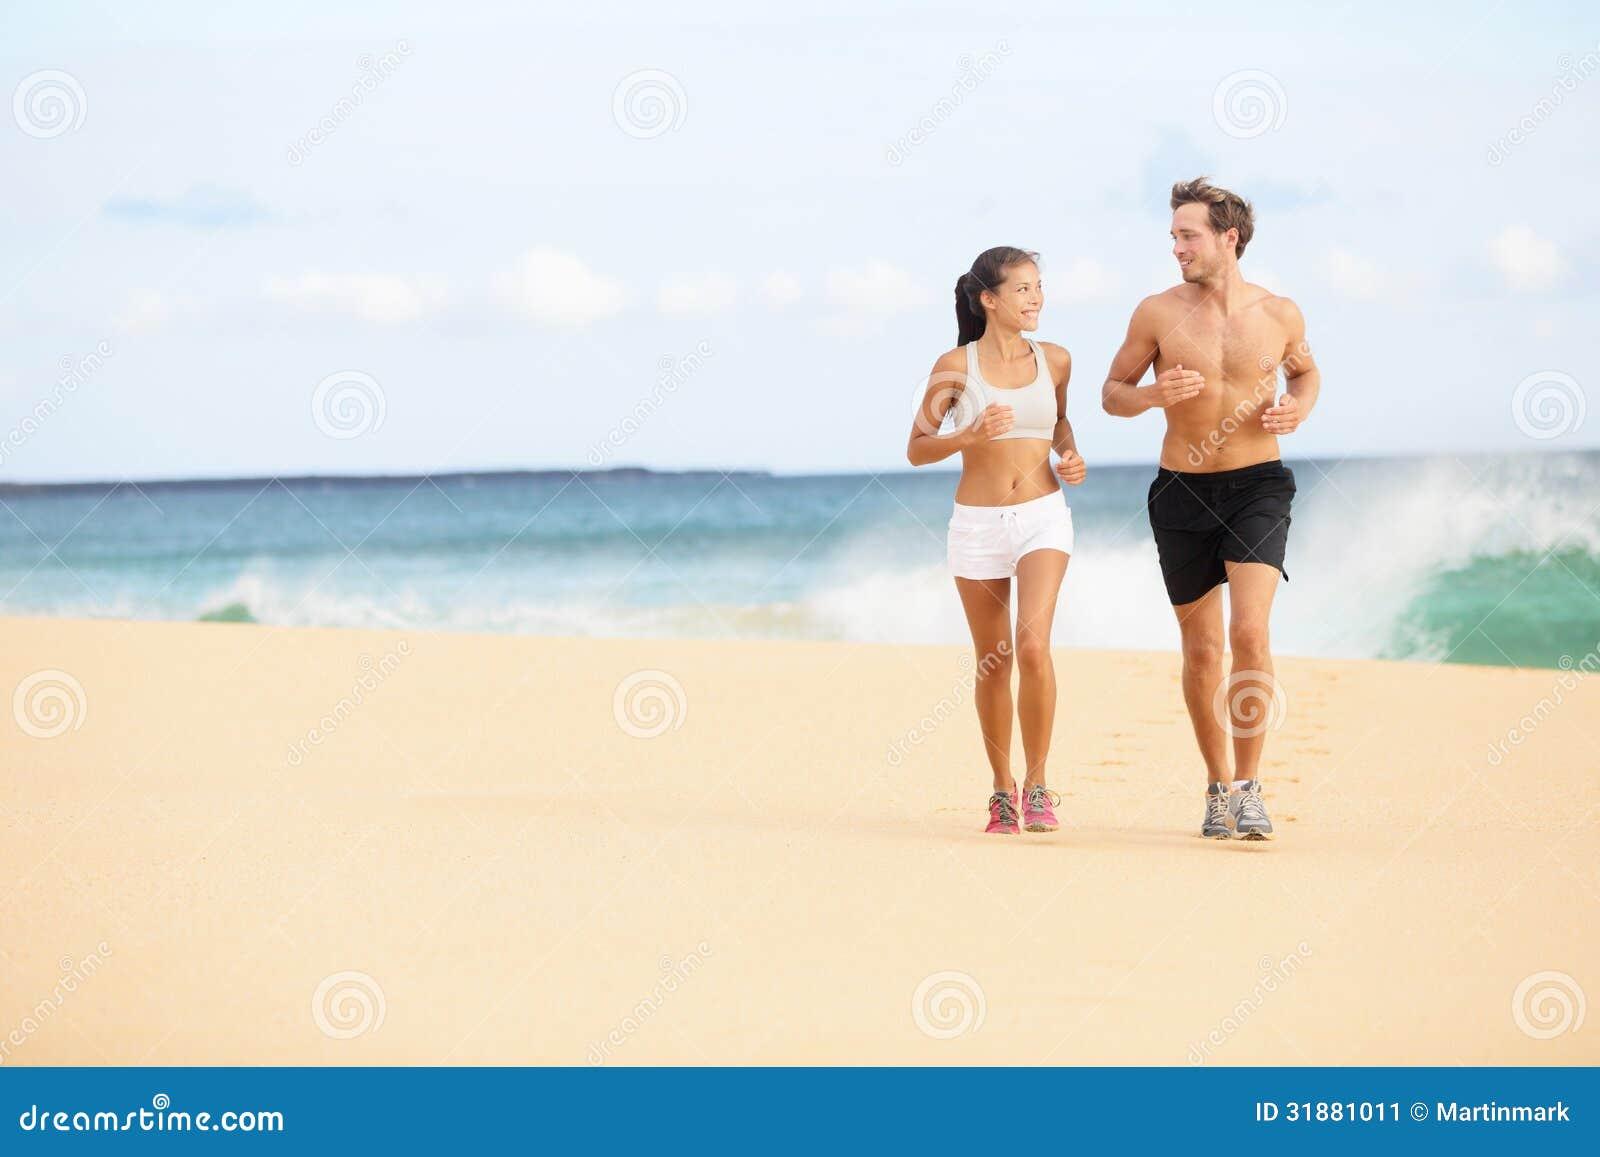 Спортсменки на пляже фото 8 фотография